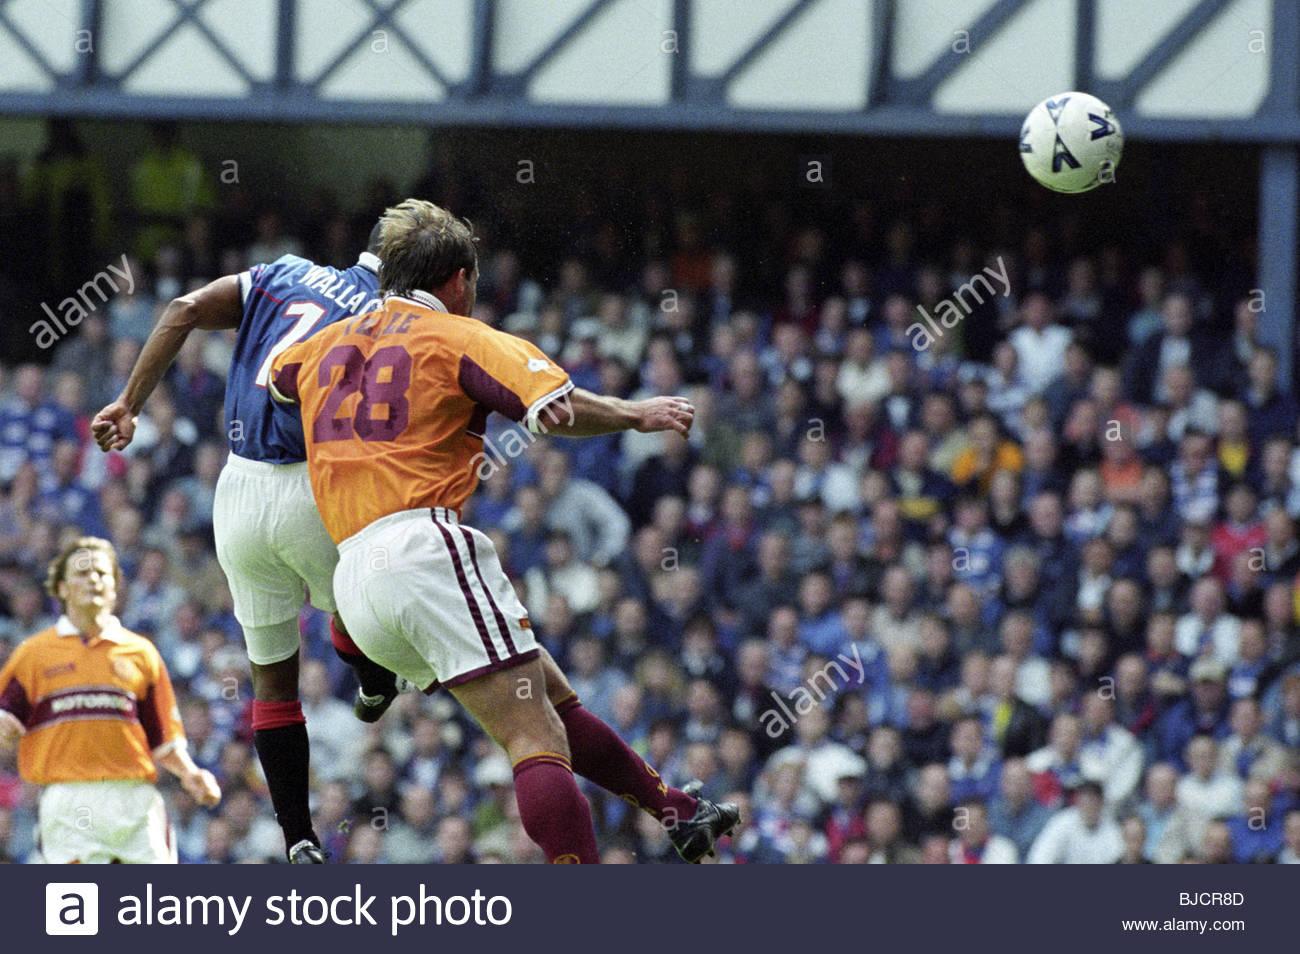 15/08/98 SPL RANGERS V MOTHERWELL (2-1) IBROX - GLASGOW Rod Wallace (left) beats Motherwell defender Shaun Teale - Stock Image